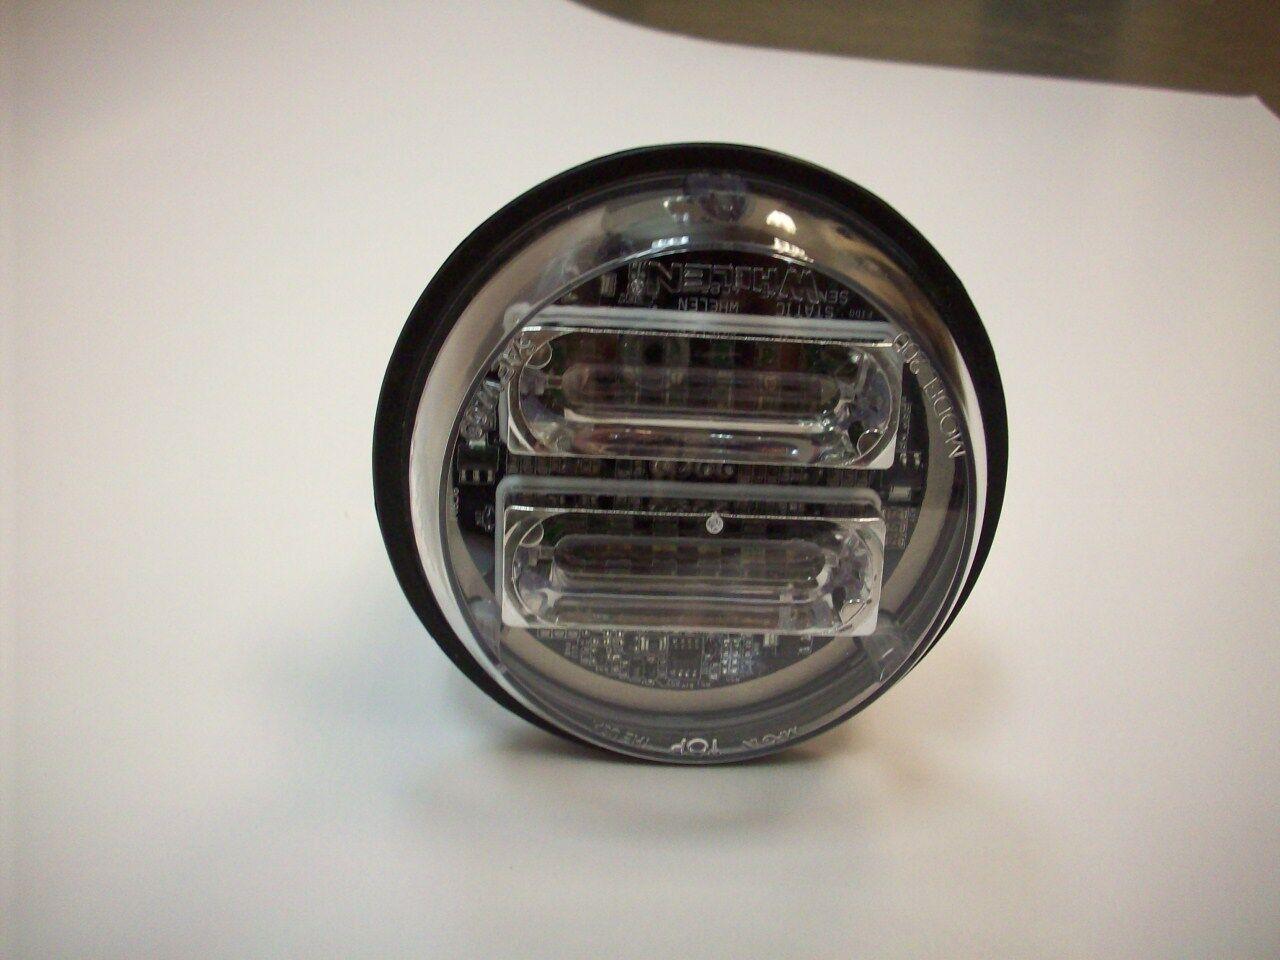 Whelen fedc06br led fog lights 2006 10 dodge charger ebay picture 1 of 4 sciox Gallery